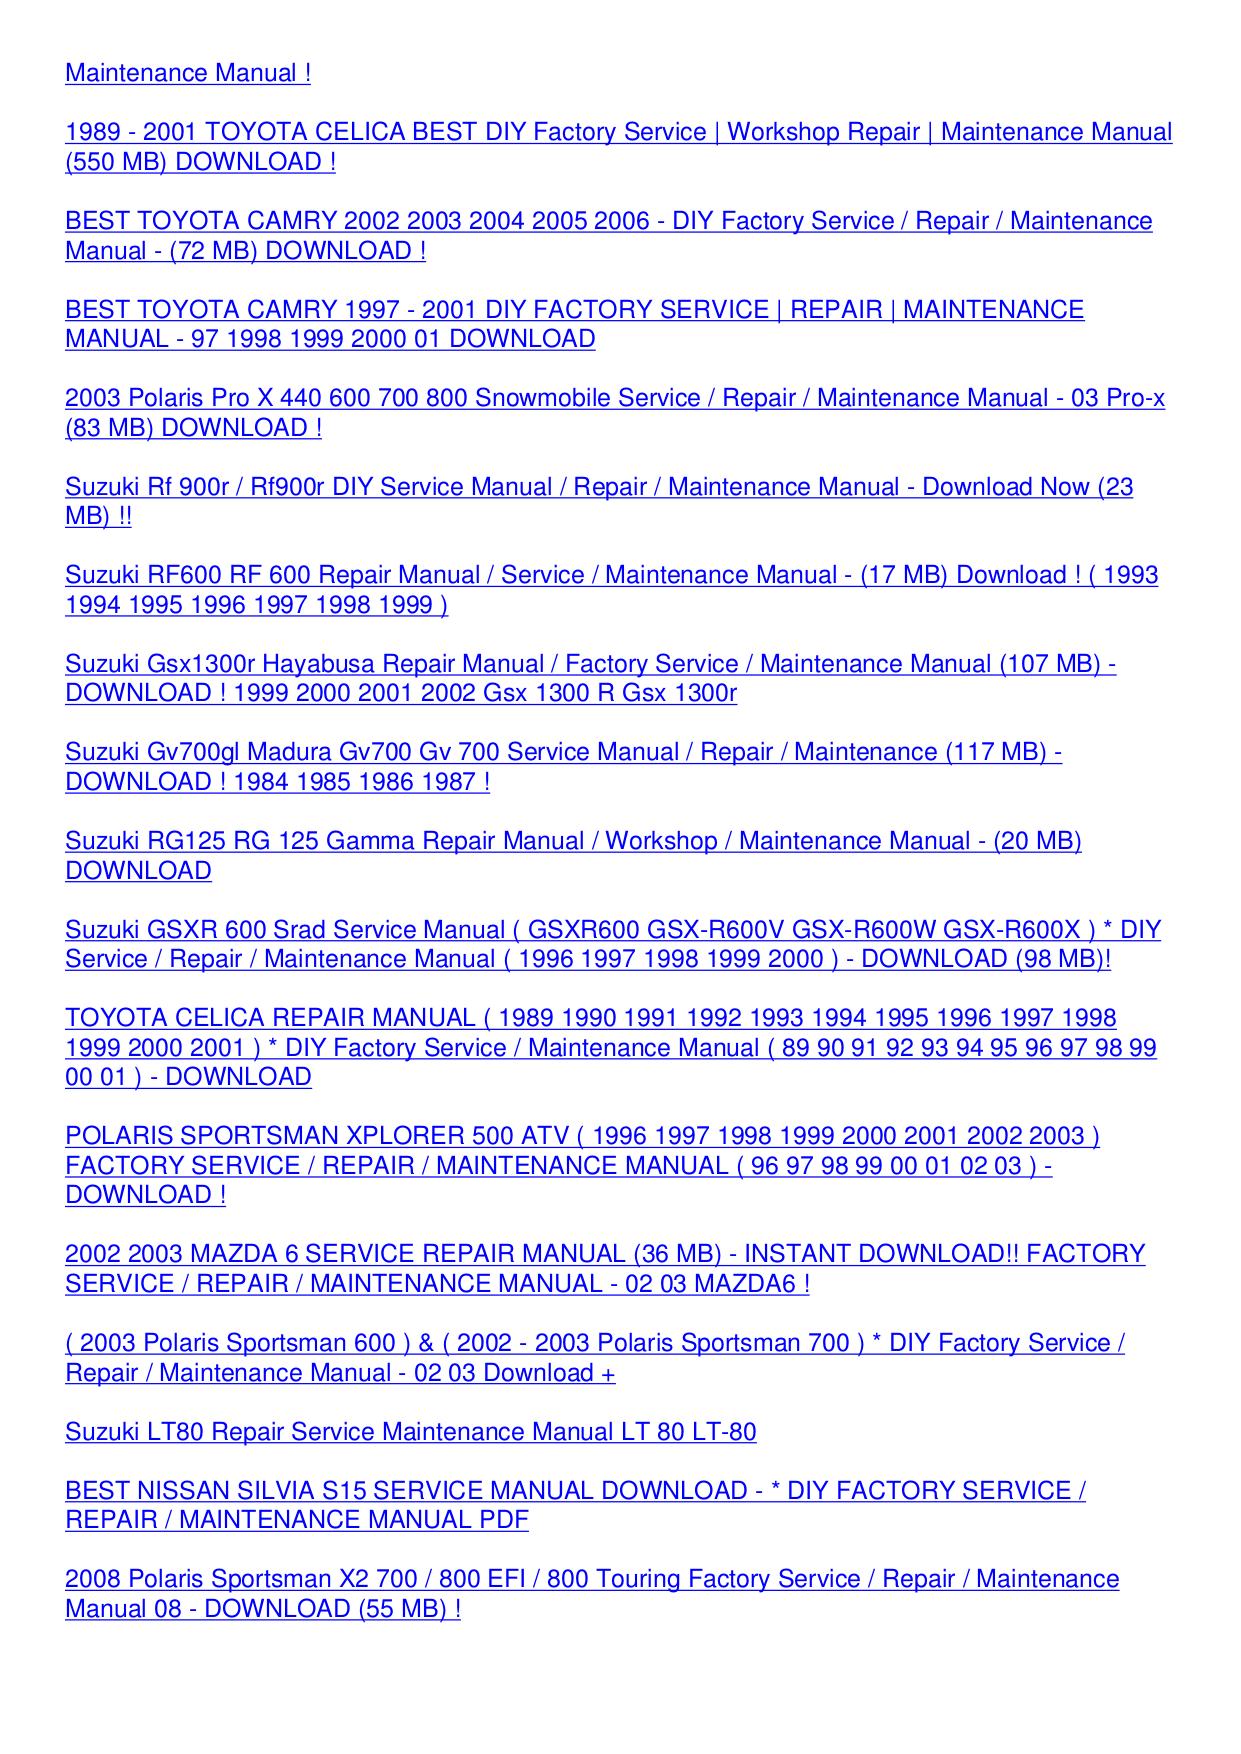 ... Array - mazda 6 service manual download rh mazda 6 service manual  download elzplorers de